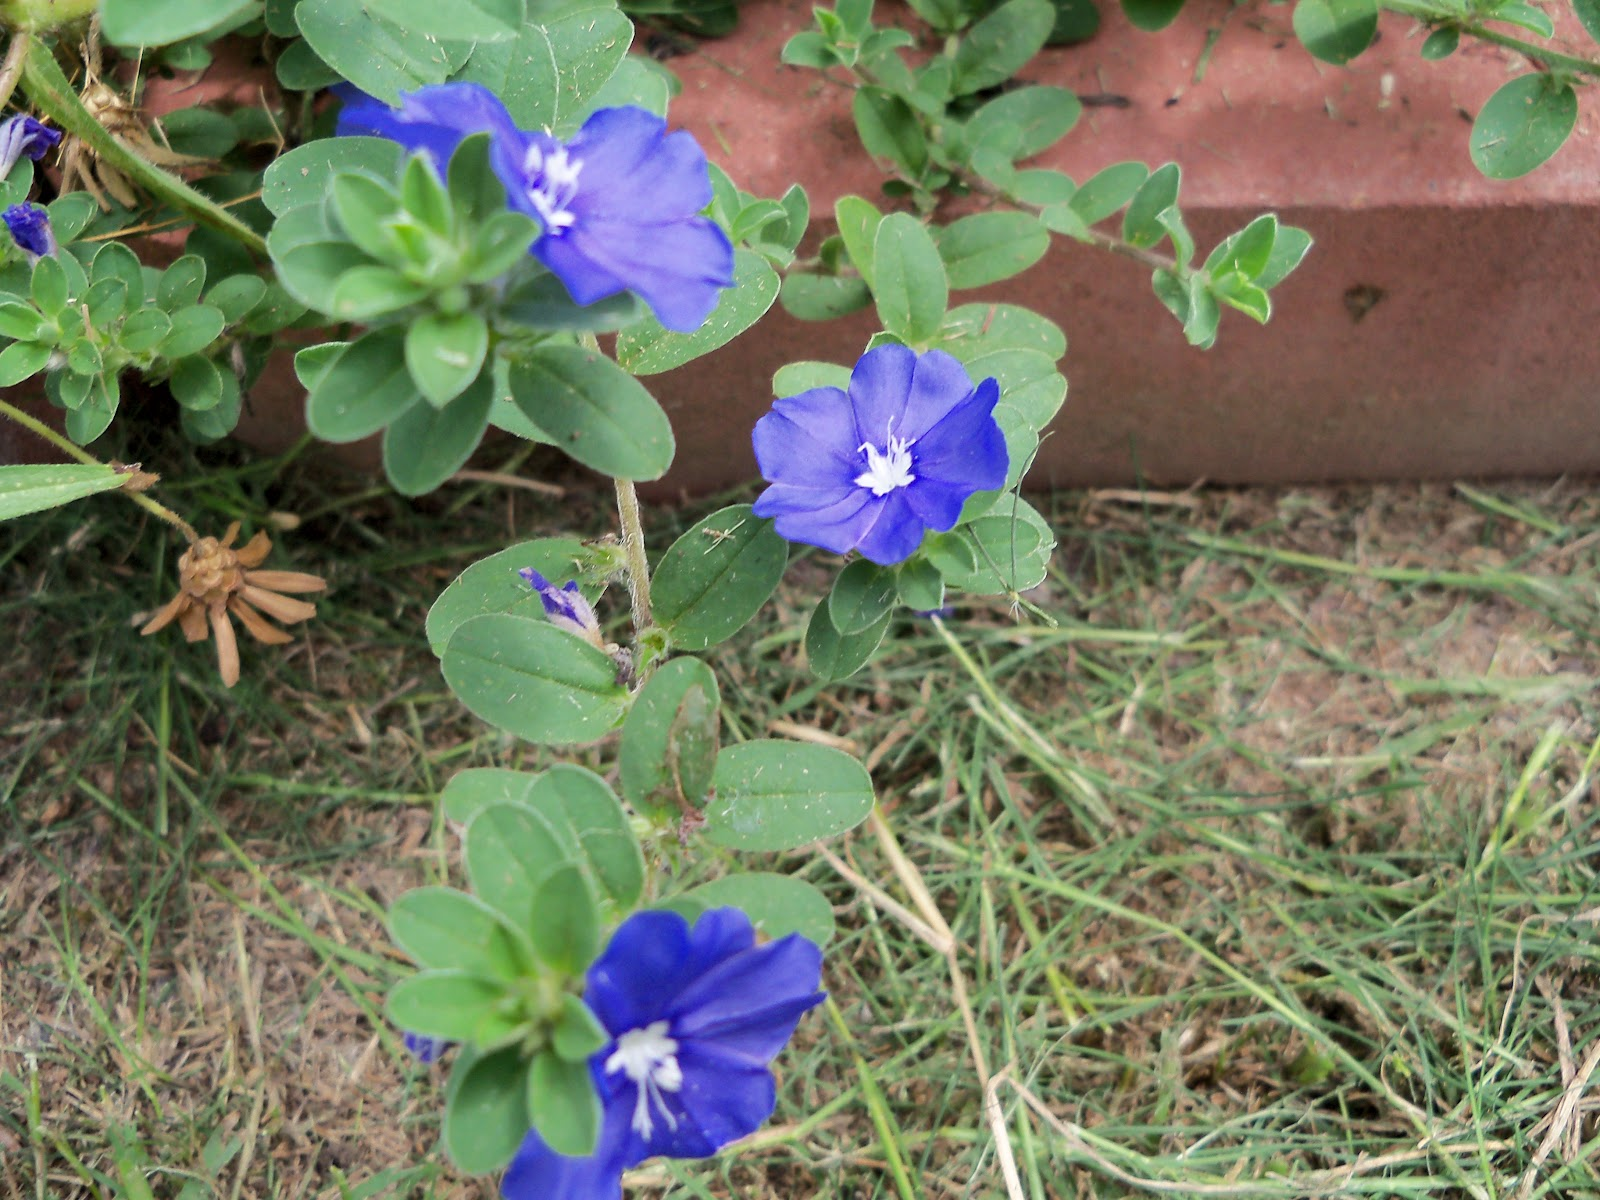 Gardening 2010, Part Three - 101_5302.JPG